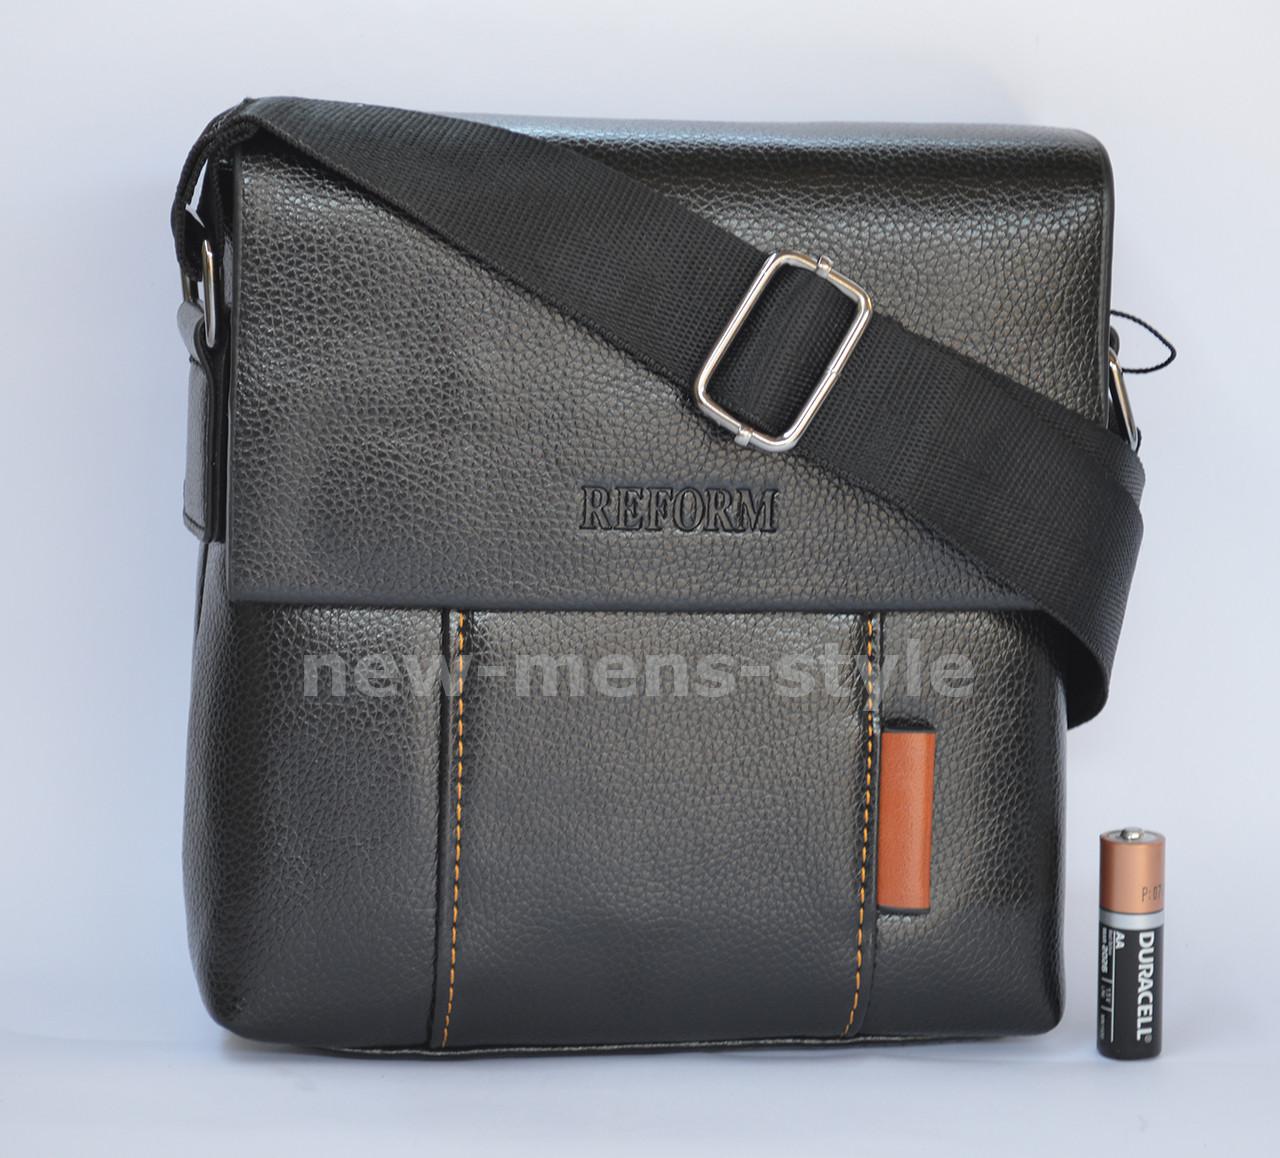 7c5d4642916c Сумка рюкзак барсетка мужская кожаная фирменная под Polo, Jeep REFORM -